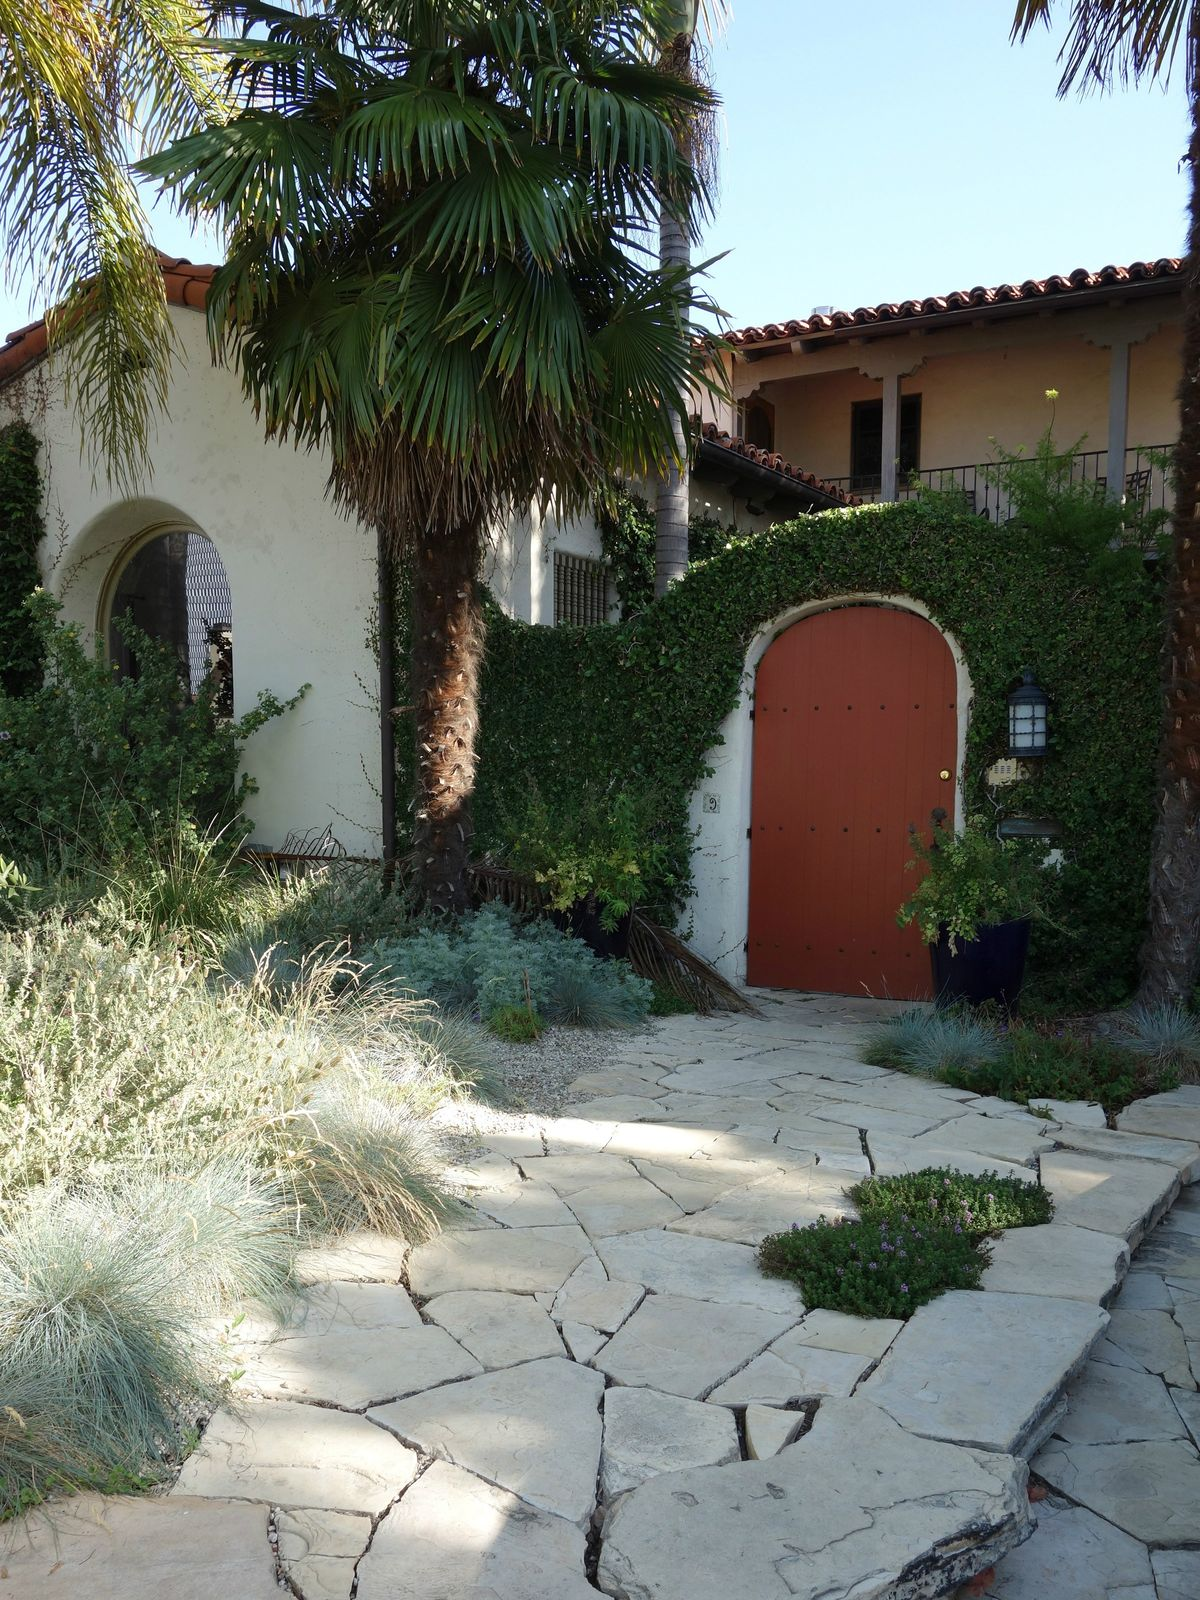 Authentic Courtyard Spanish